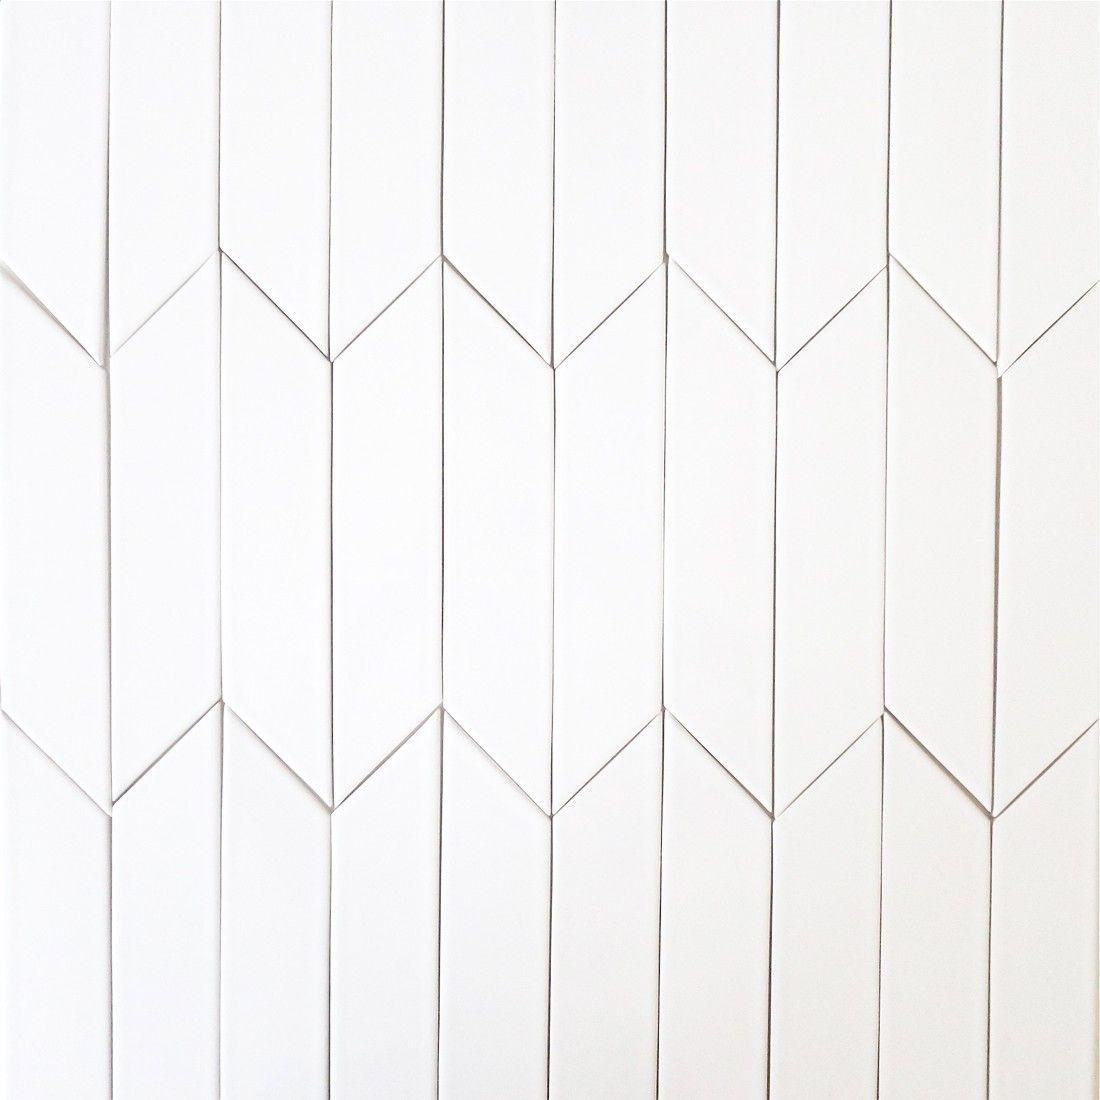 Chevron tile 2x8 milk 1401052 sports office db pinterest backsplash kiln ceramic chevron subway tile white milk vertical close up headboard dailygadgetfo Images